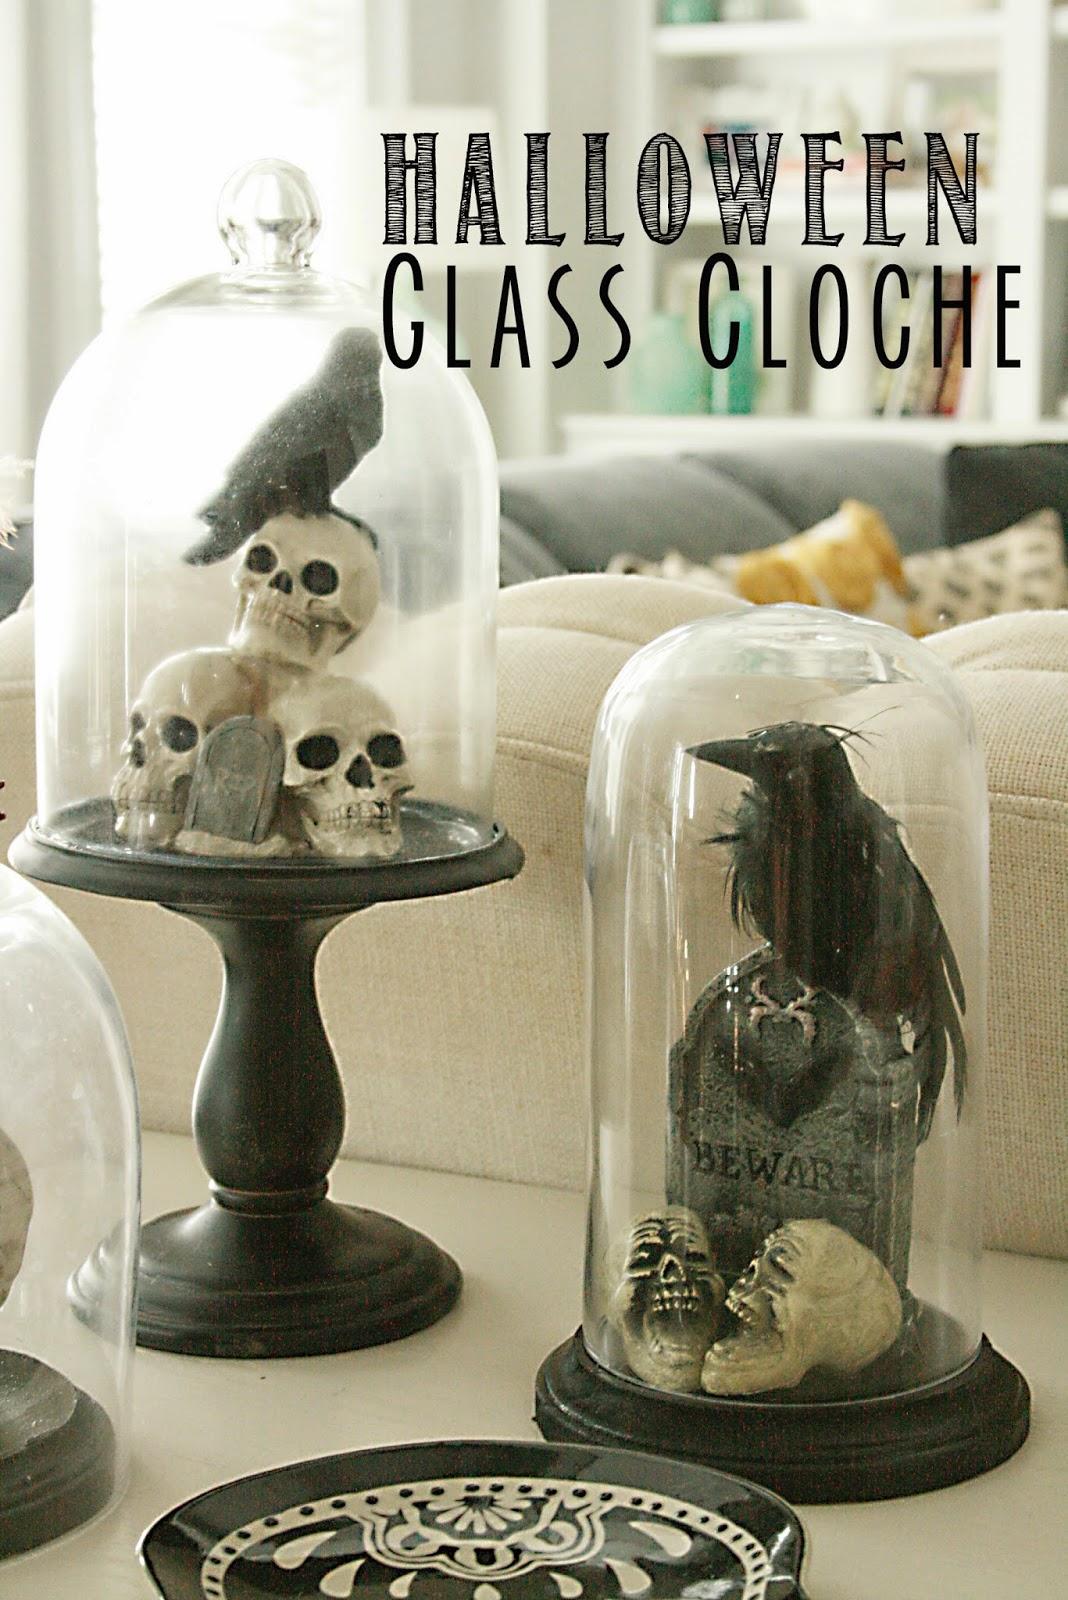 Diy Halloween Glass Cloche Darling Darleen A Lifestyle Design Blog